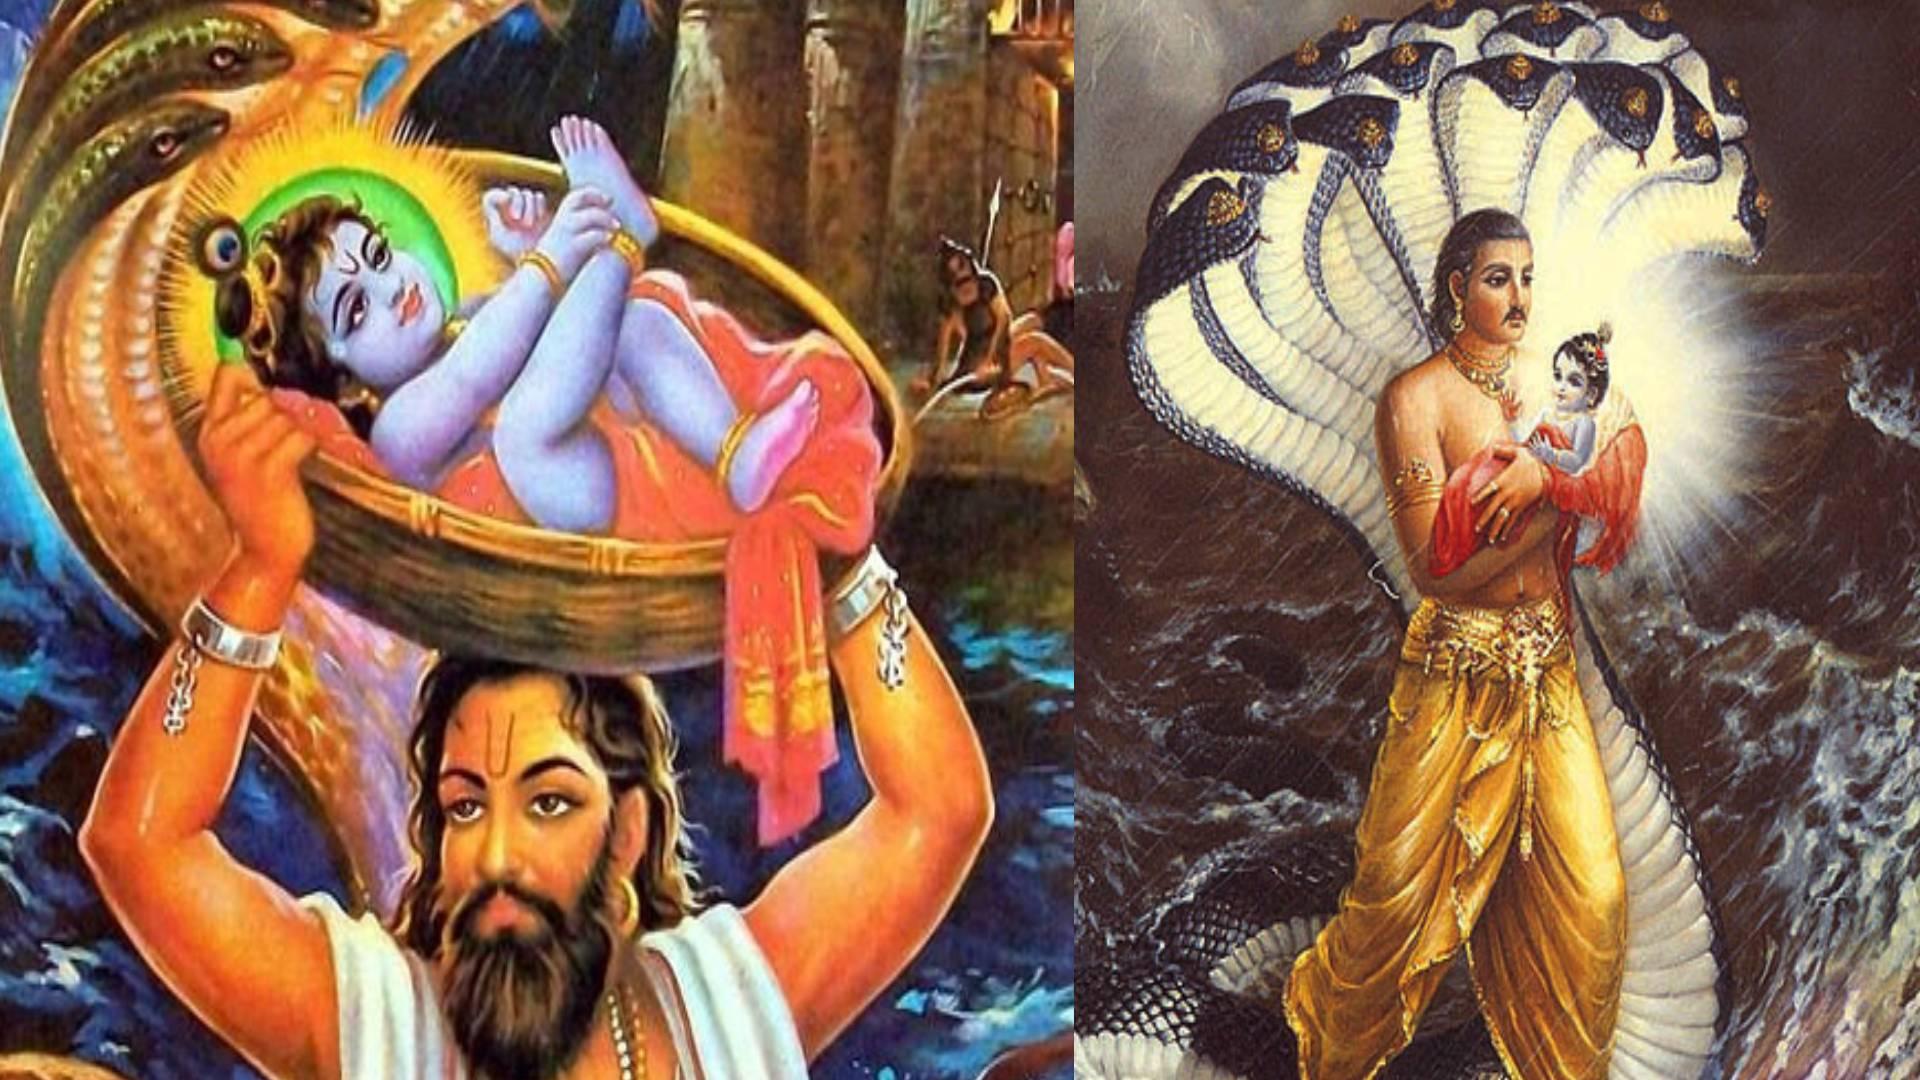 PunjabKesari, Krishna Janmashtami image, Krishna Janmashtami photo,Krishna photo, कृष्ण जन्माष्टमी इमेज,कृष्ण जन्माष्टमी फोटो,कृष्ण फोटो